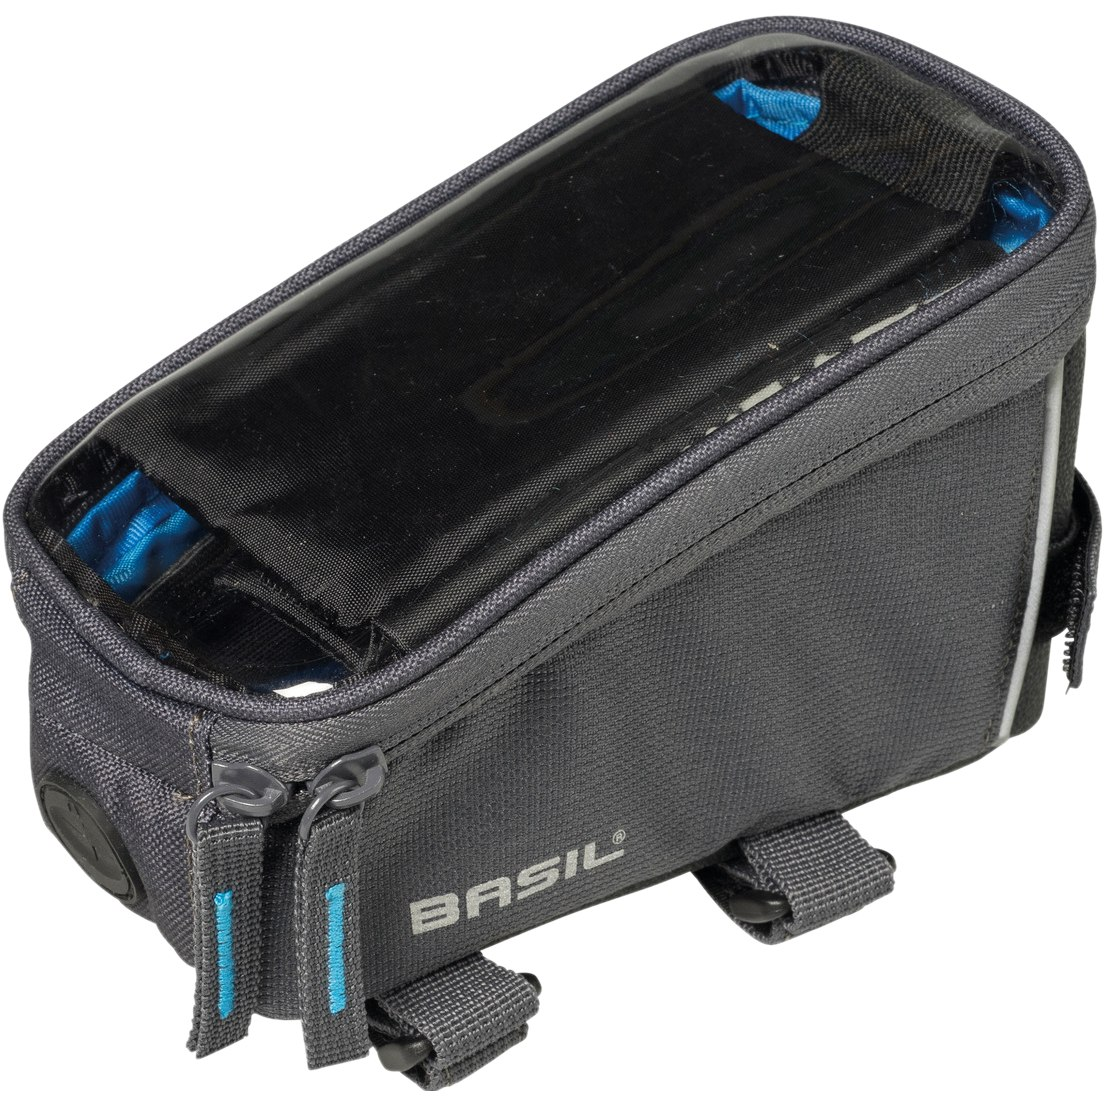 Basil Sport Designt Frame Bag - graphite